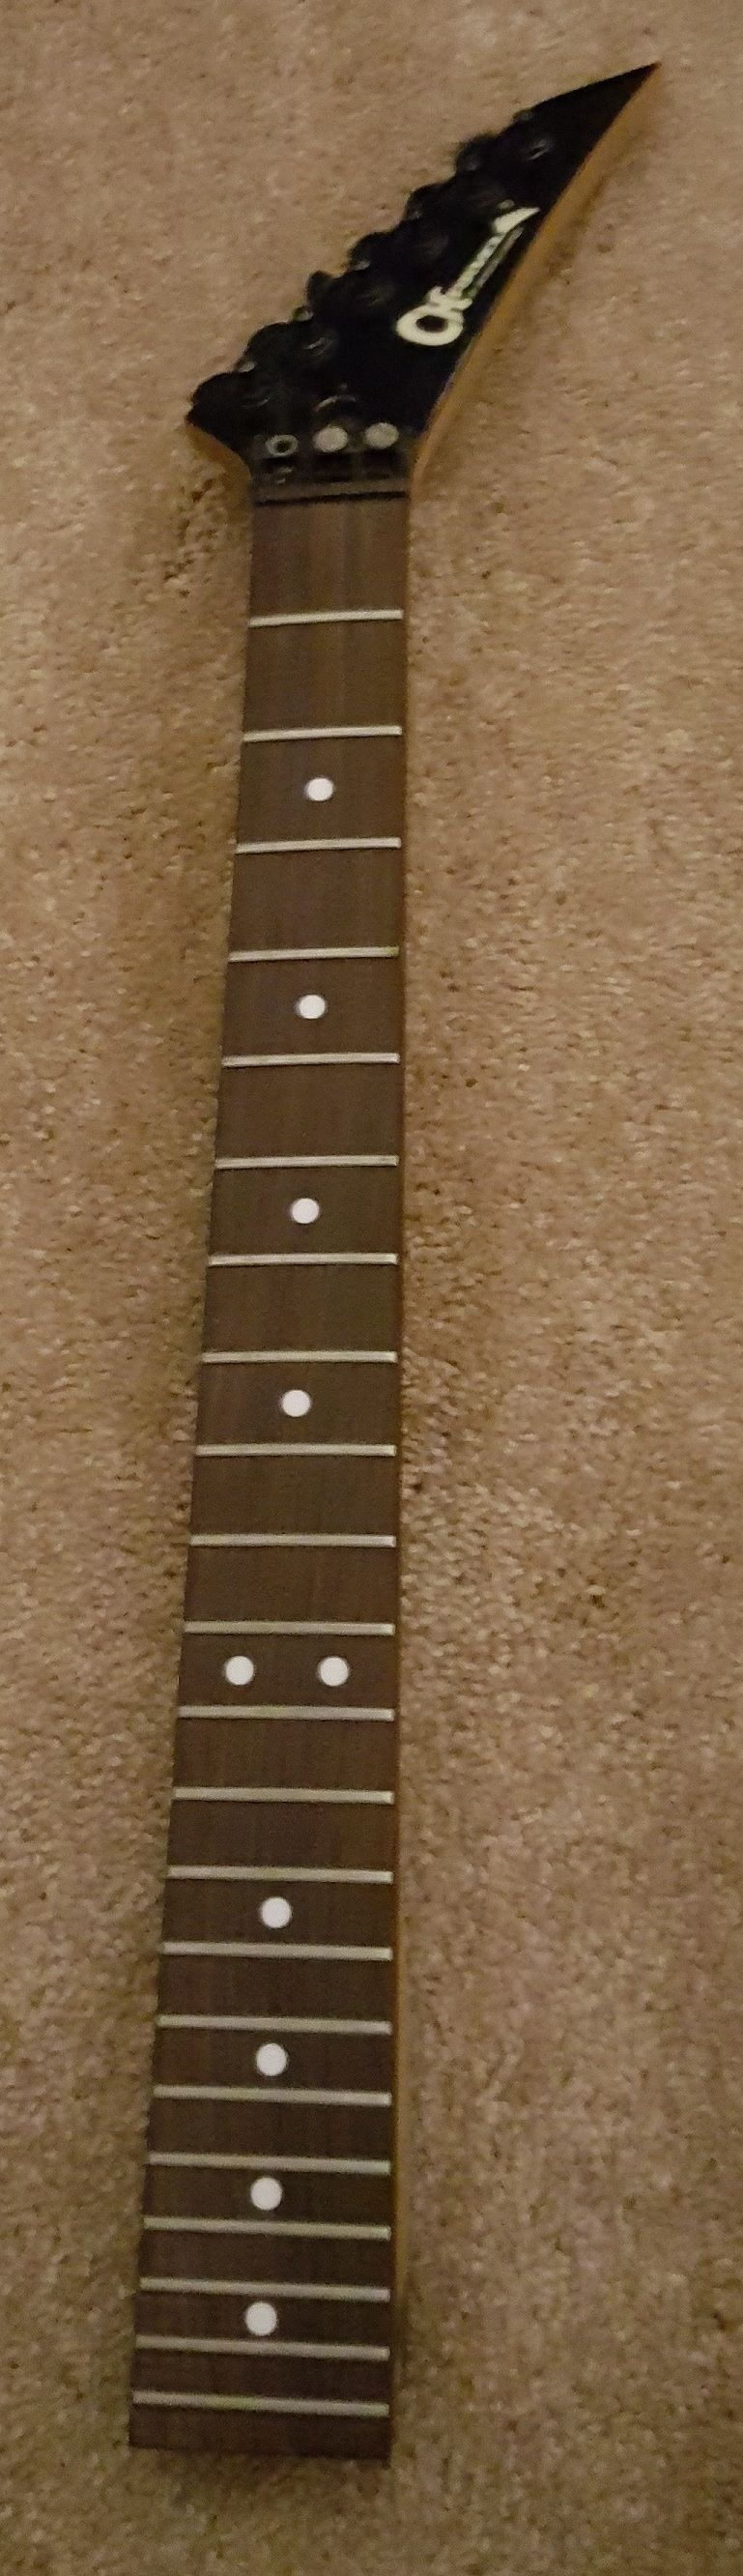 Please Help Me Identify This Guitar Kramer Focus Wiring Diagram Http Imageshackcom A Img924 3341 Pm20yb